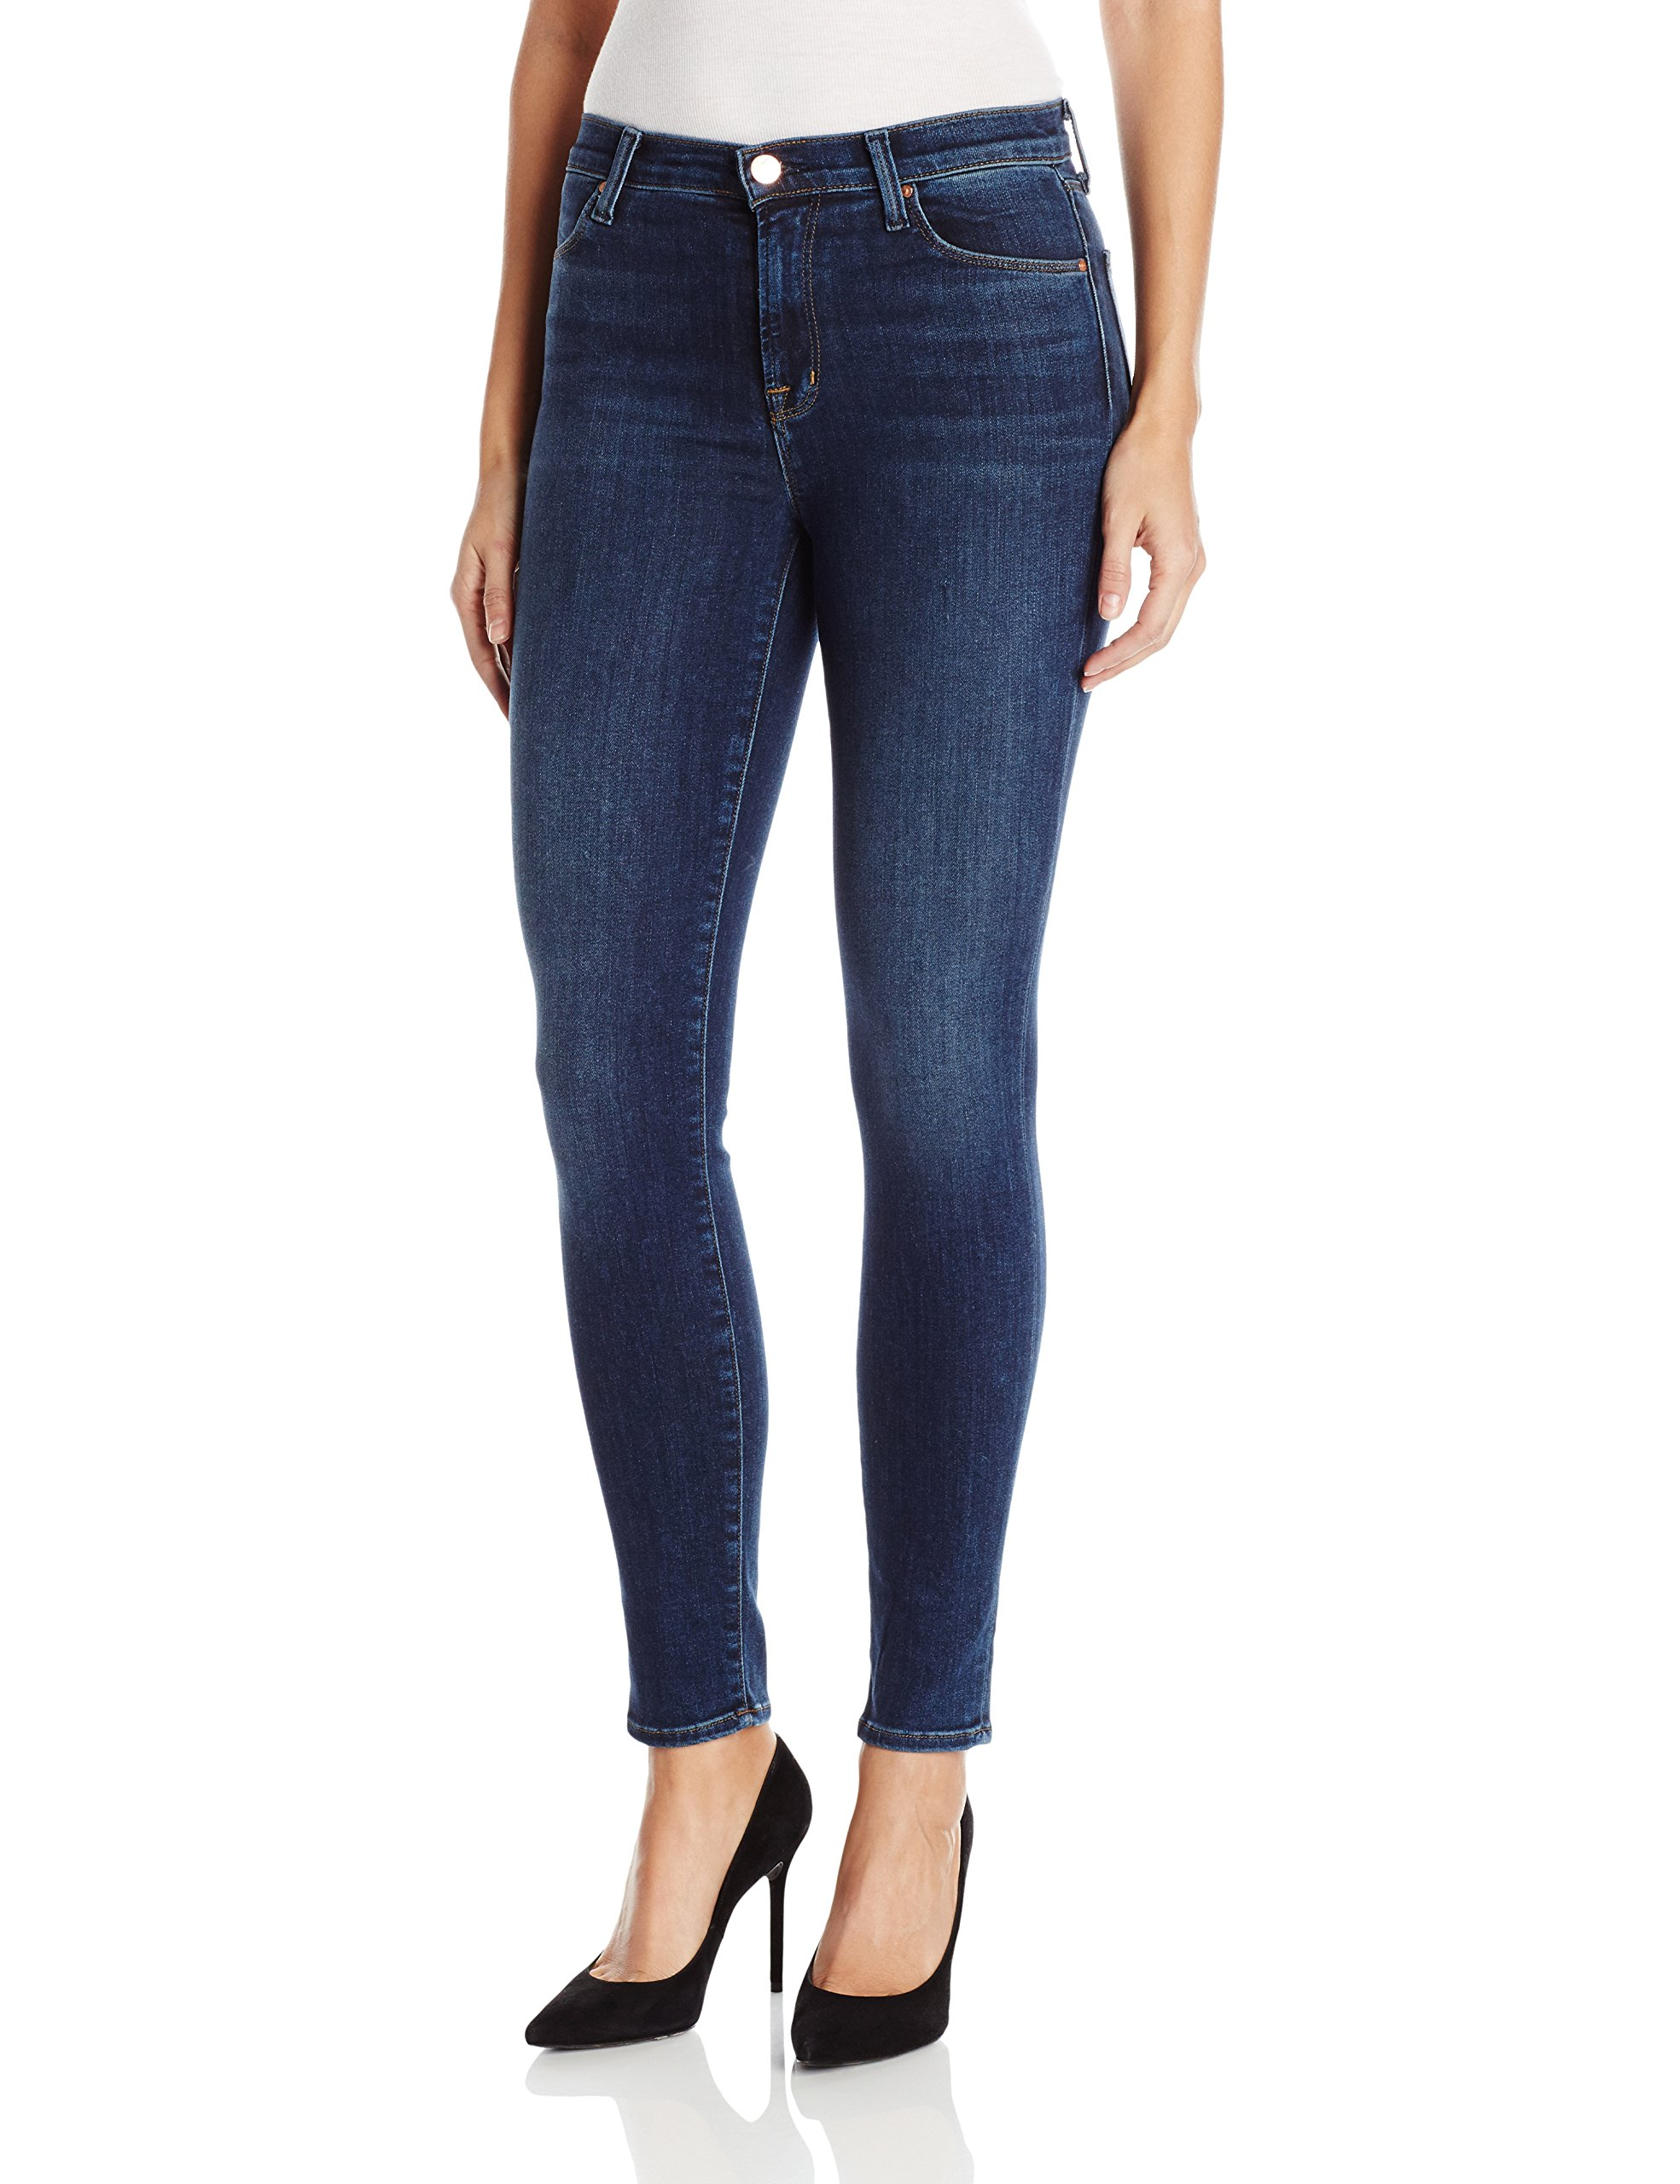 J Brand Jeans Women's 23110 Maria High Rise Skinny Jean, Fleeting, 25